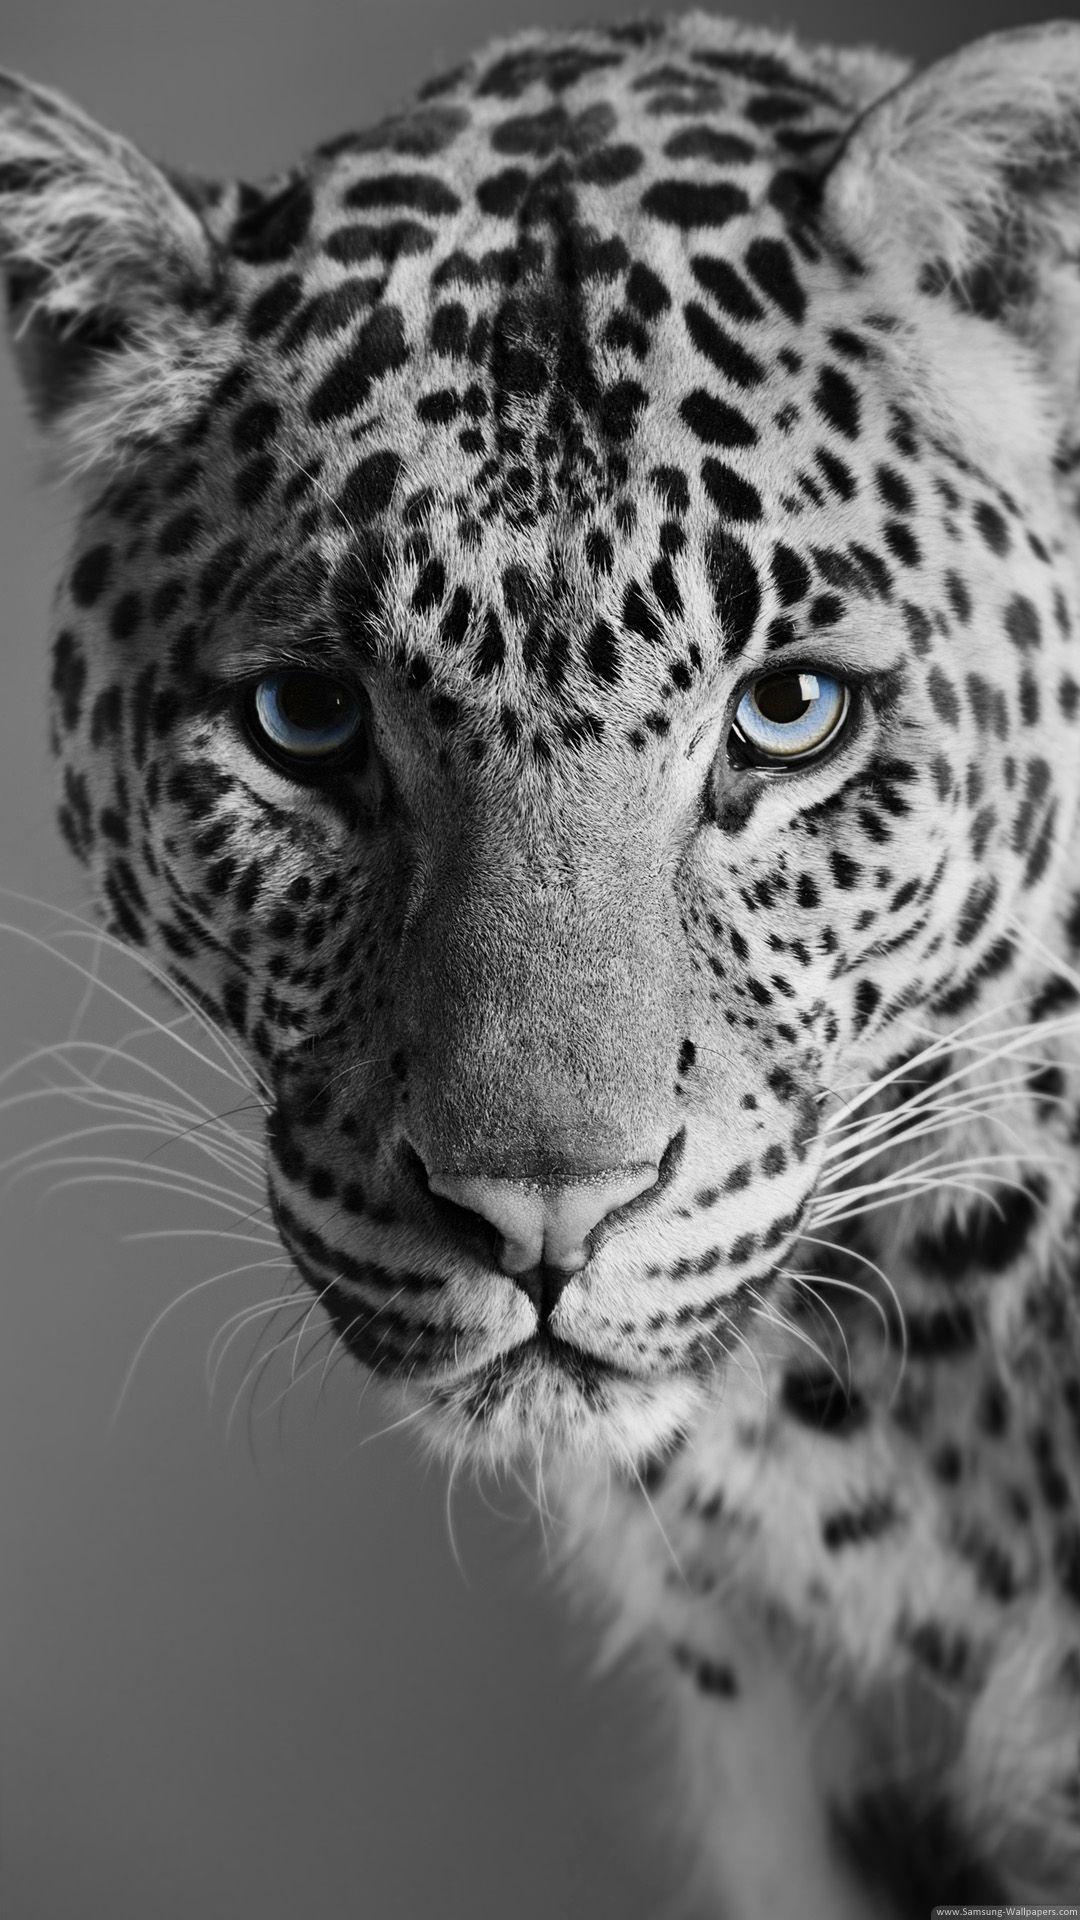 Leopard Lock Wild Animal Wallpaper Animals Black And White Animal Wallpaper